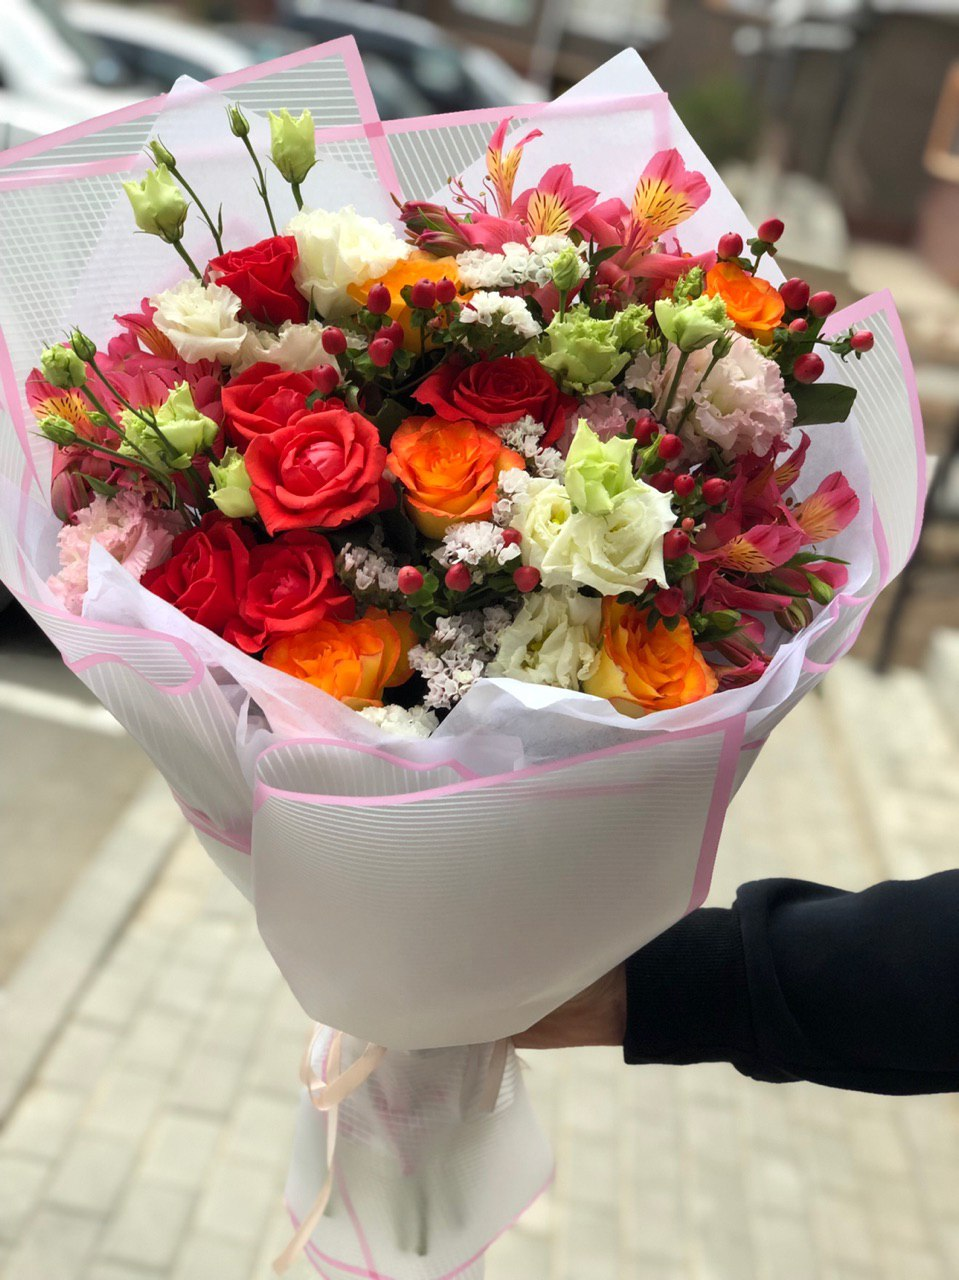 Доставка цветов г.актобе, доставка цветов